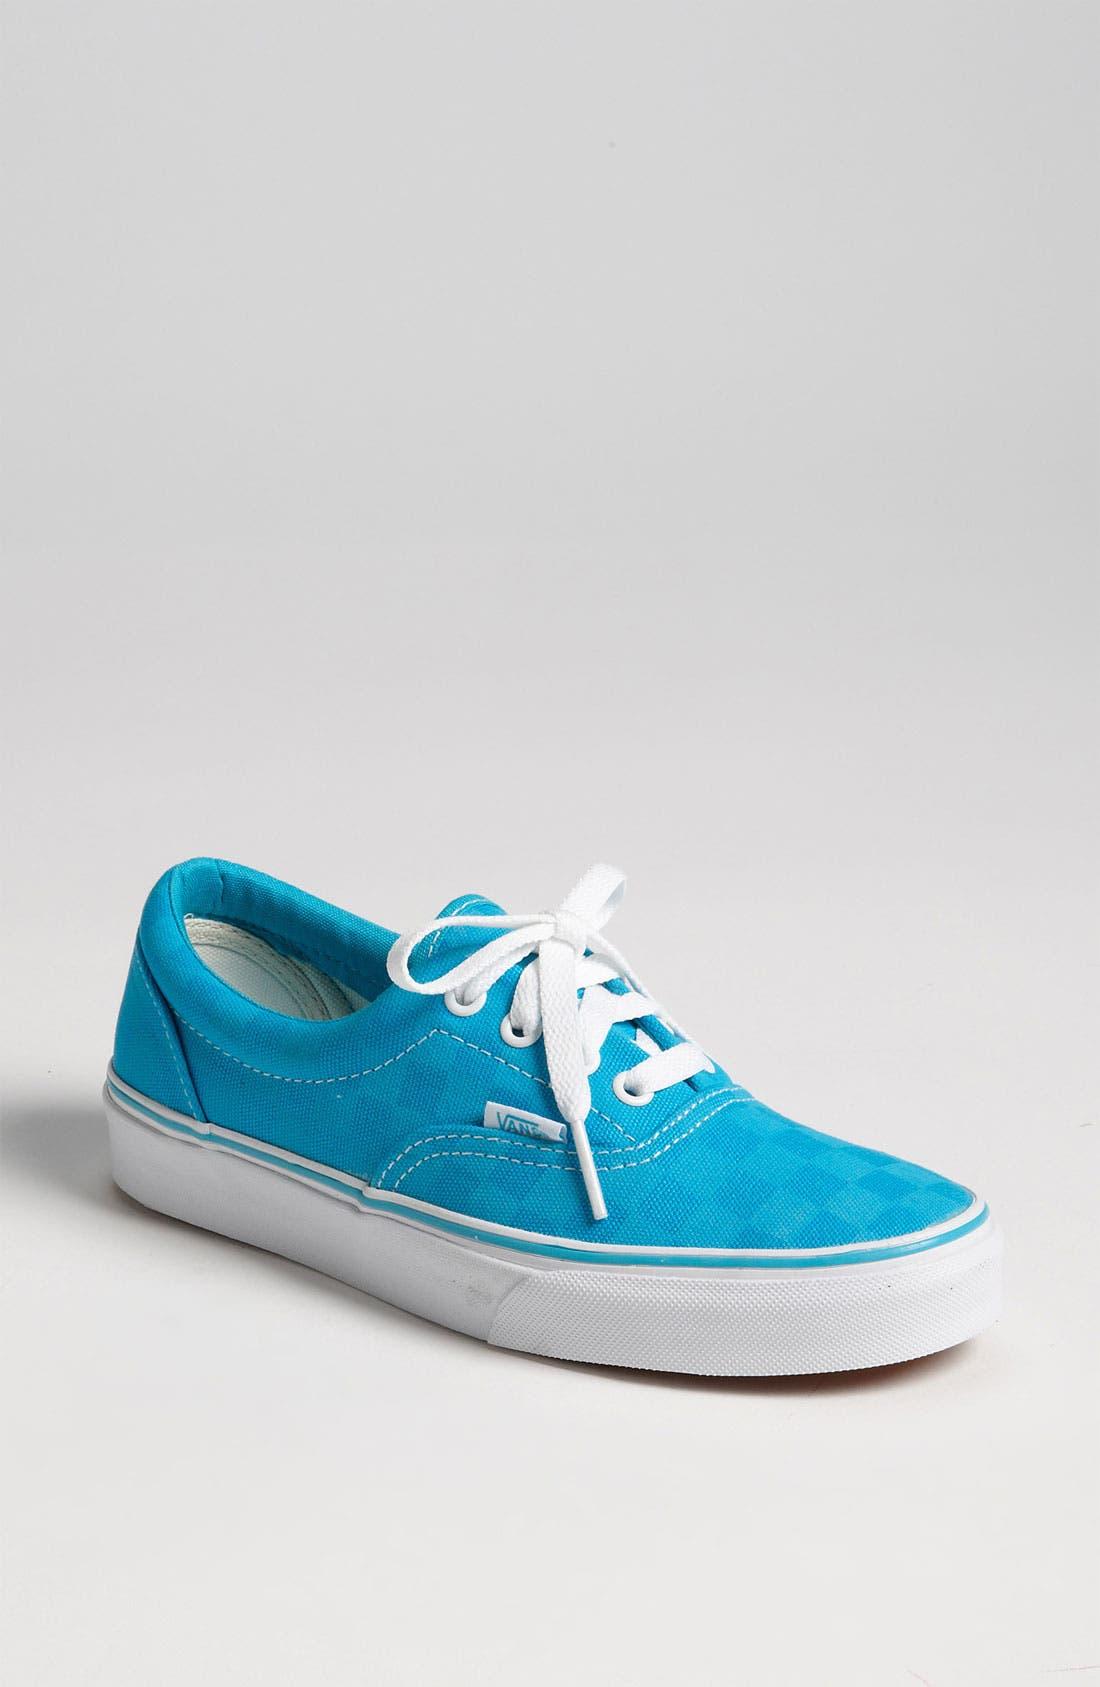 Main Image - Vans 'Era' Sneaker (Women)